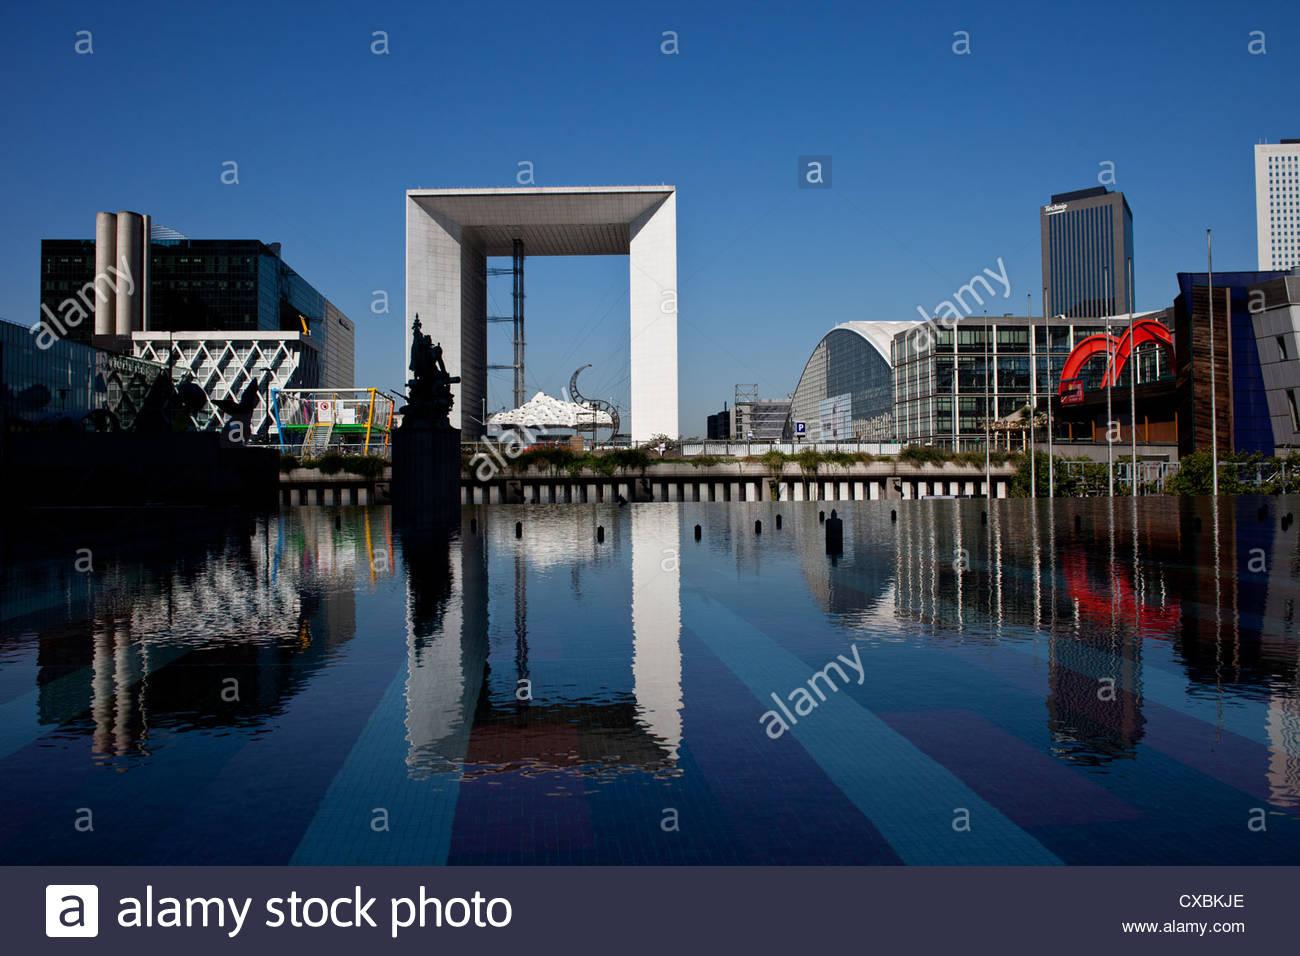 La Grande Arche reflected in a pool, La Défense, Paris. Stock Photo